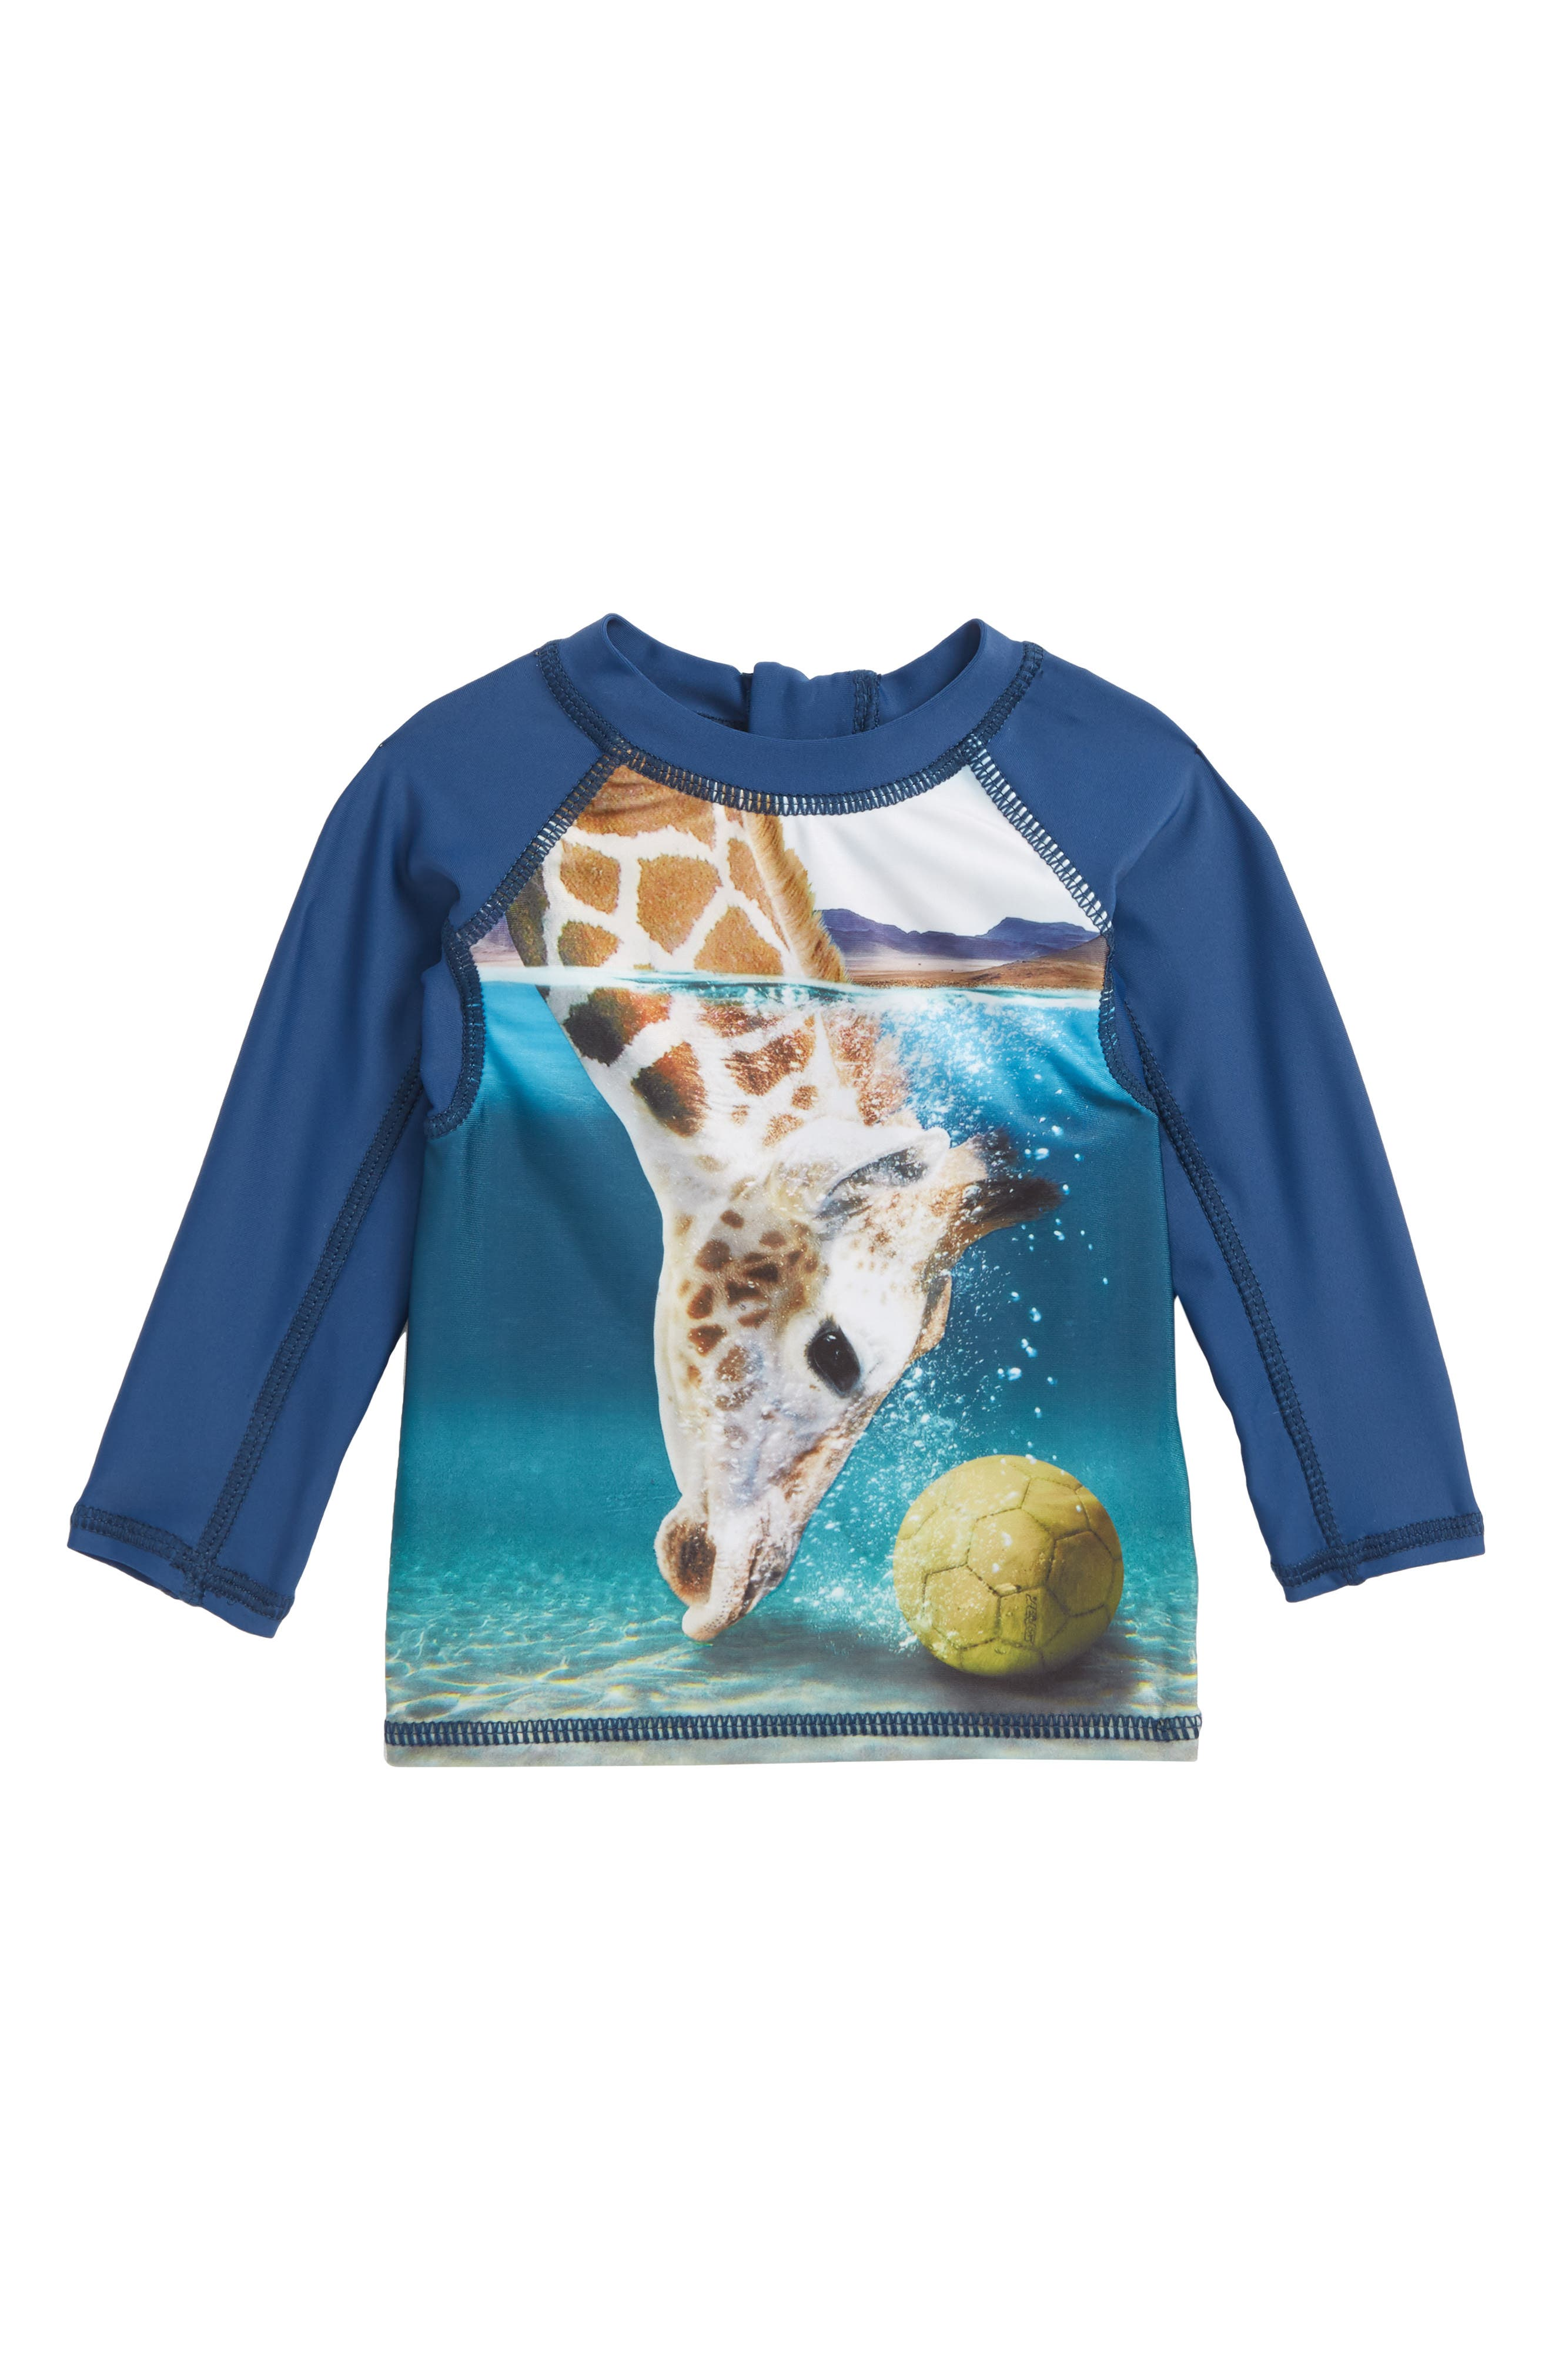 Nemo Rashguard,                             Main thumbnail 1, color,                             Giraffe